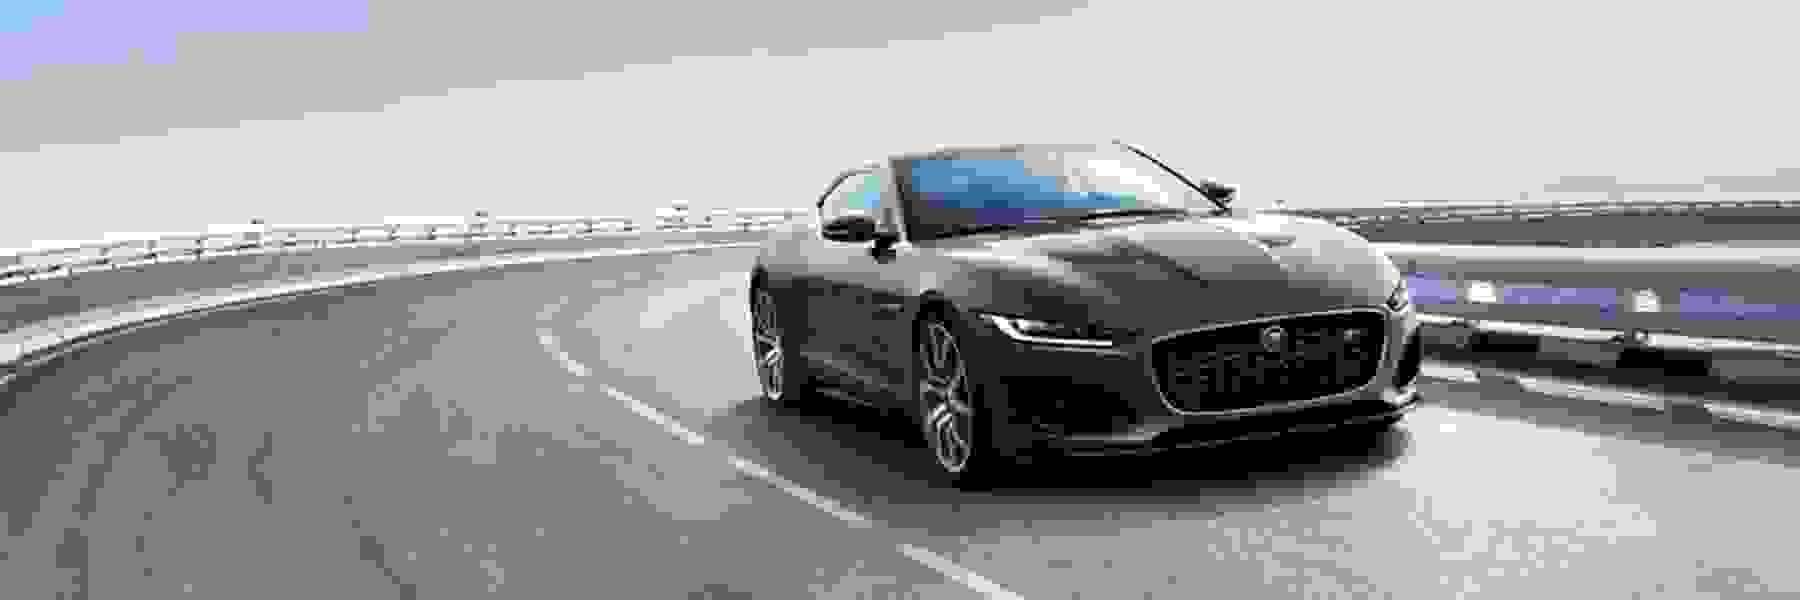 Diamond Anniversary of the Legend | Jaguar F-TYPE Heritage 60 Edition